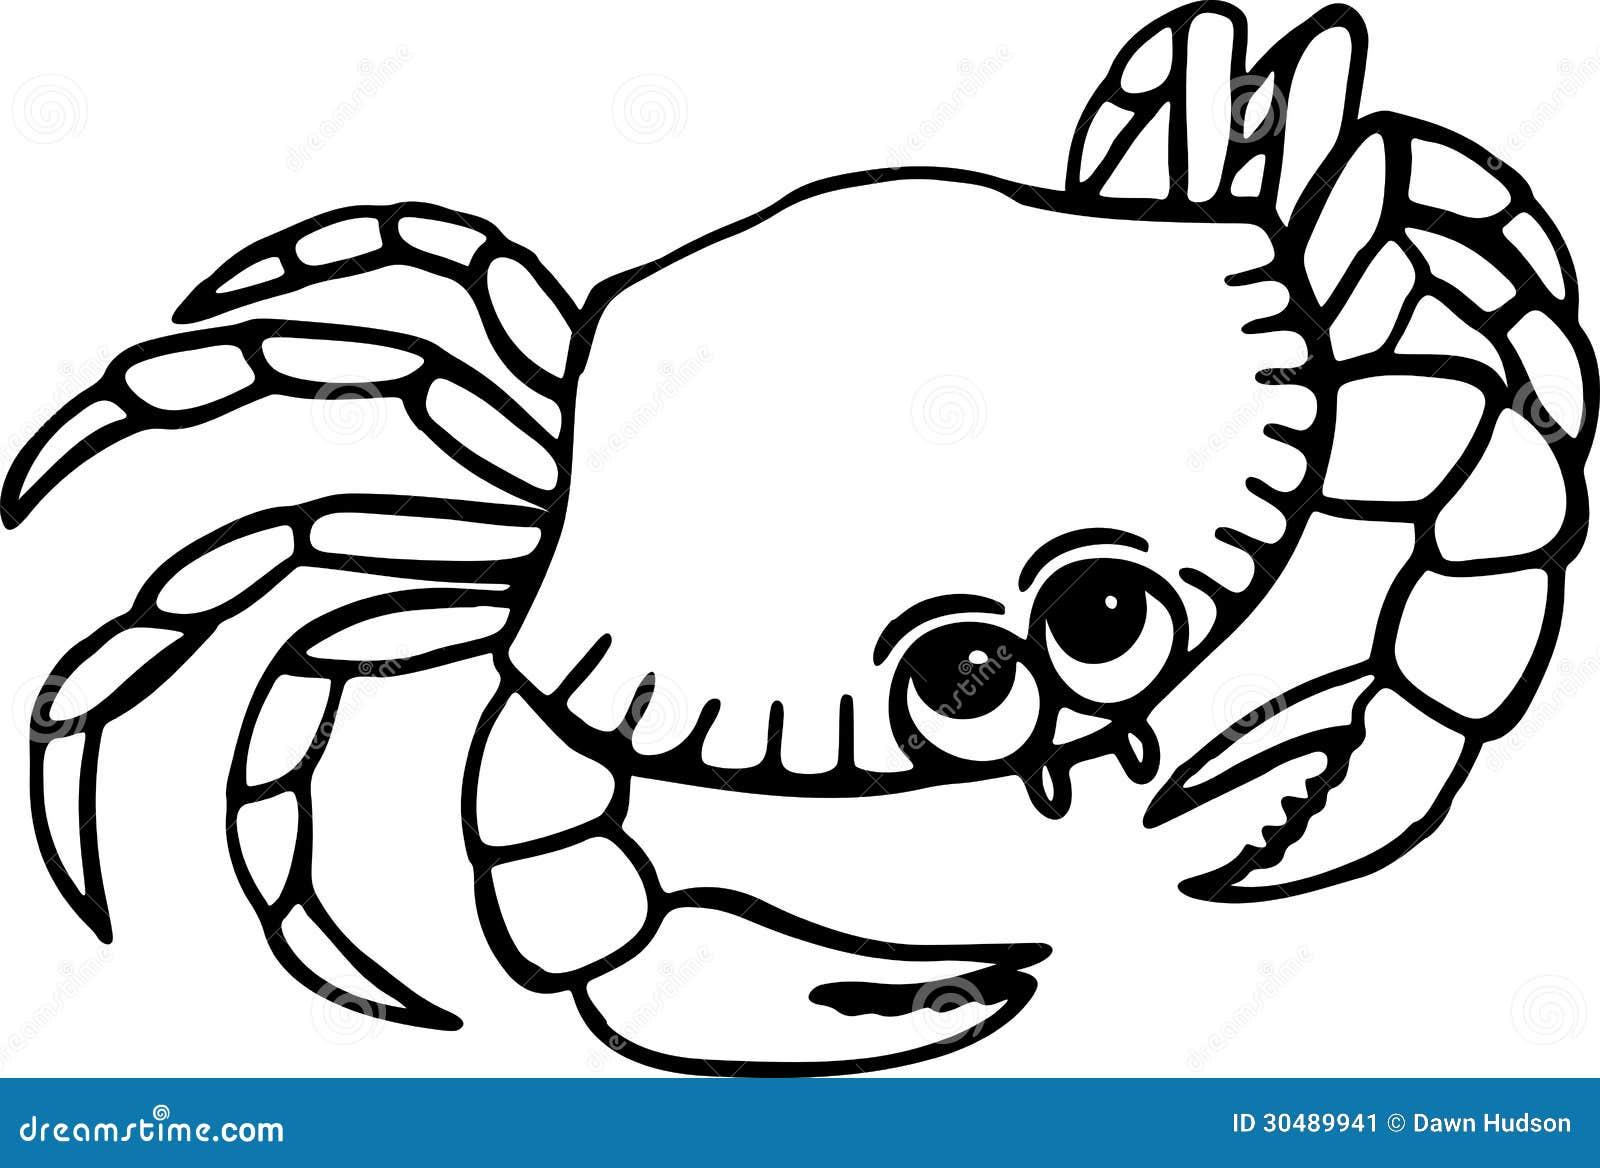 Strand clipart schwarz weiß  Strand-Krabbe Stockbild - Bild: 30489941